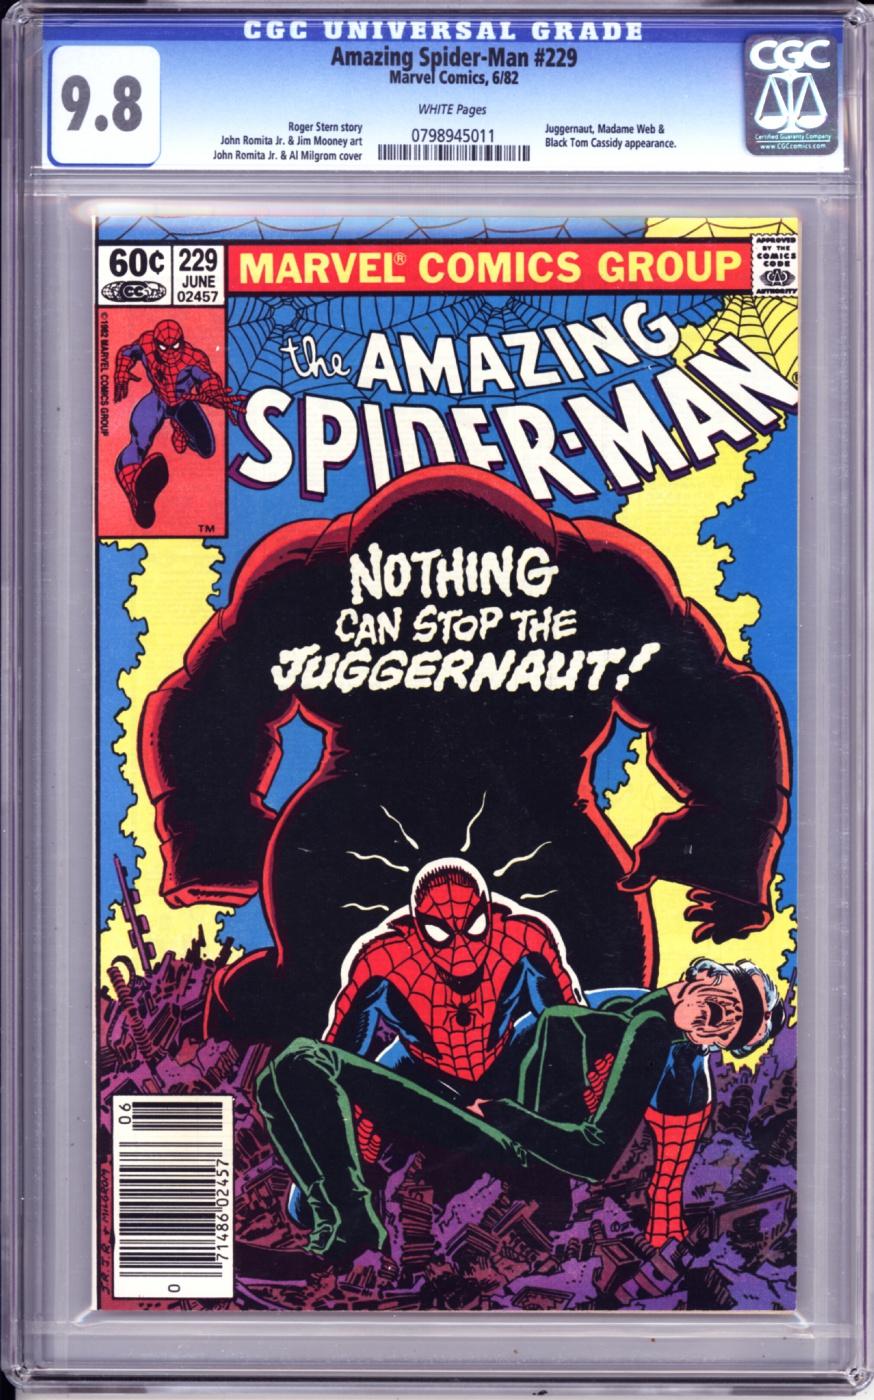 The Long Boxers - Amazing Spider-Man 229 cgc 9.8